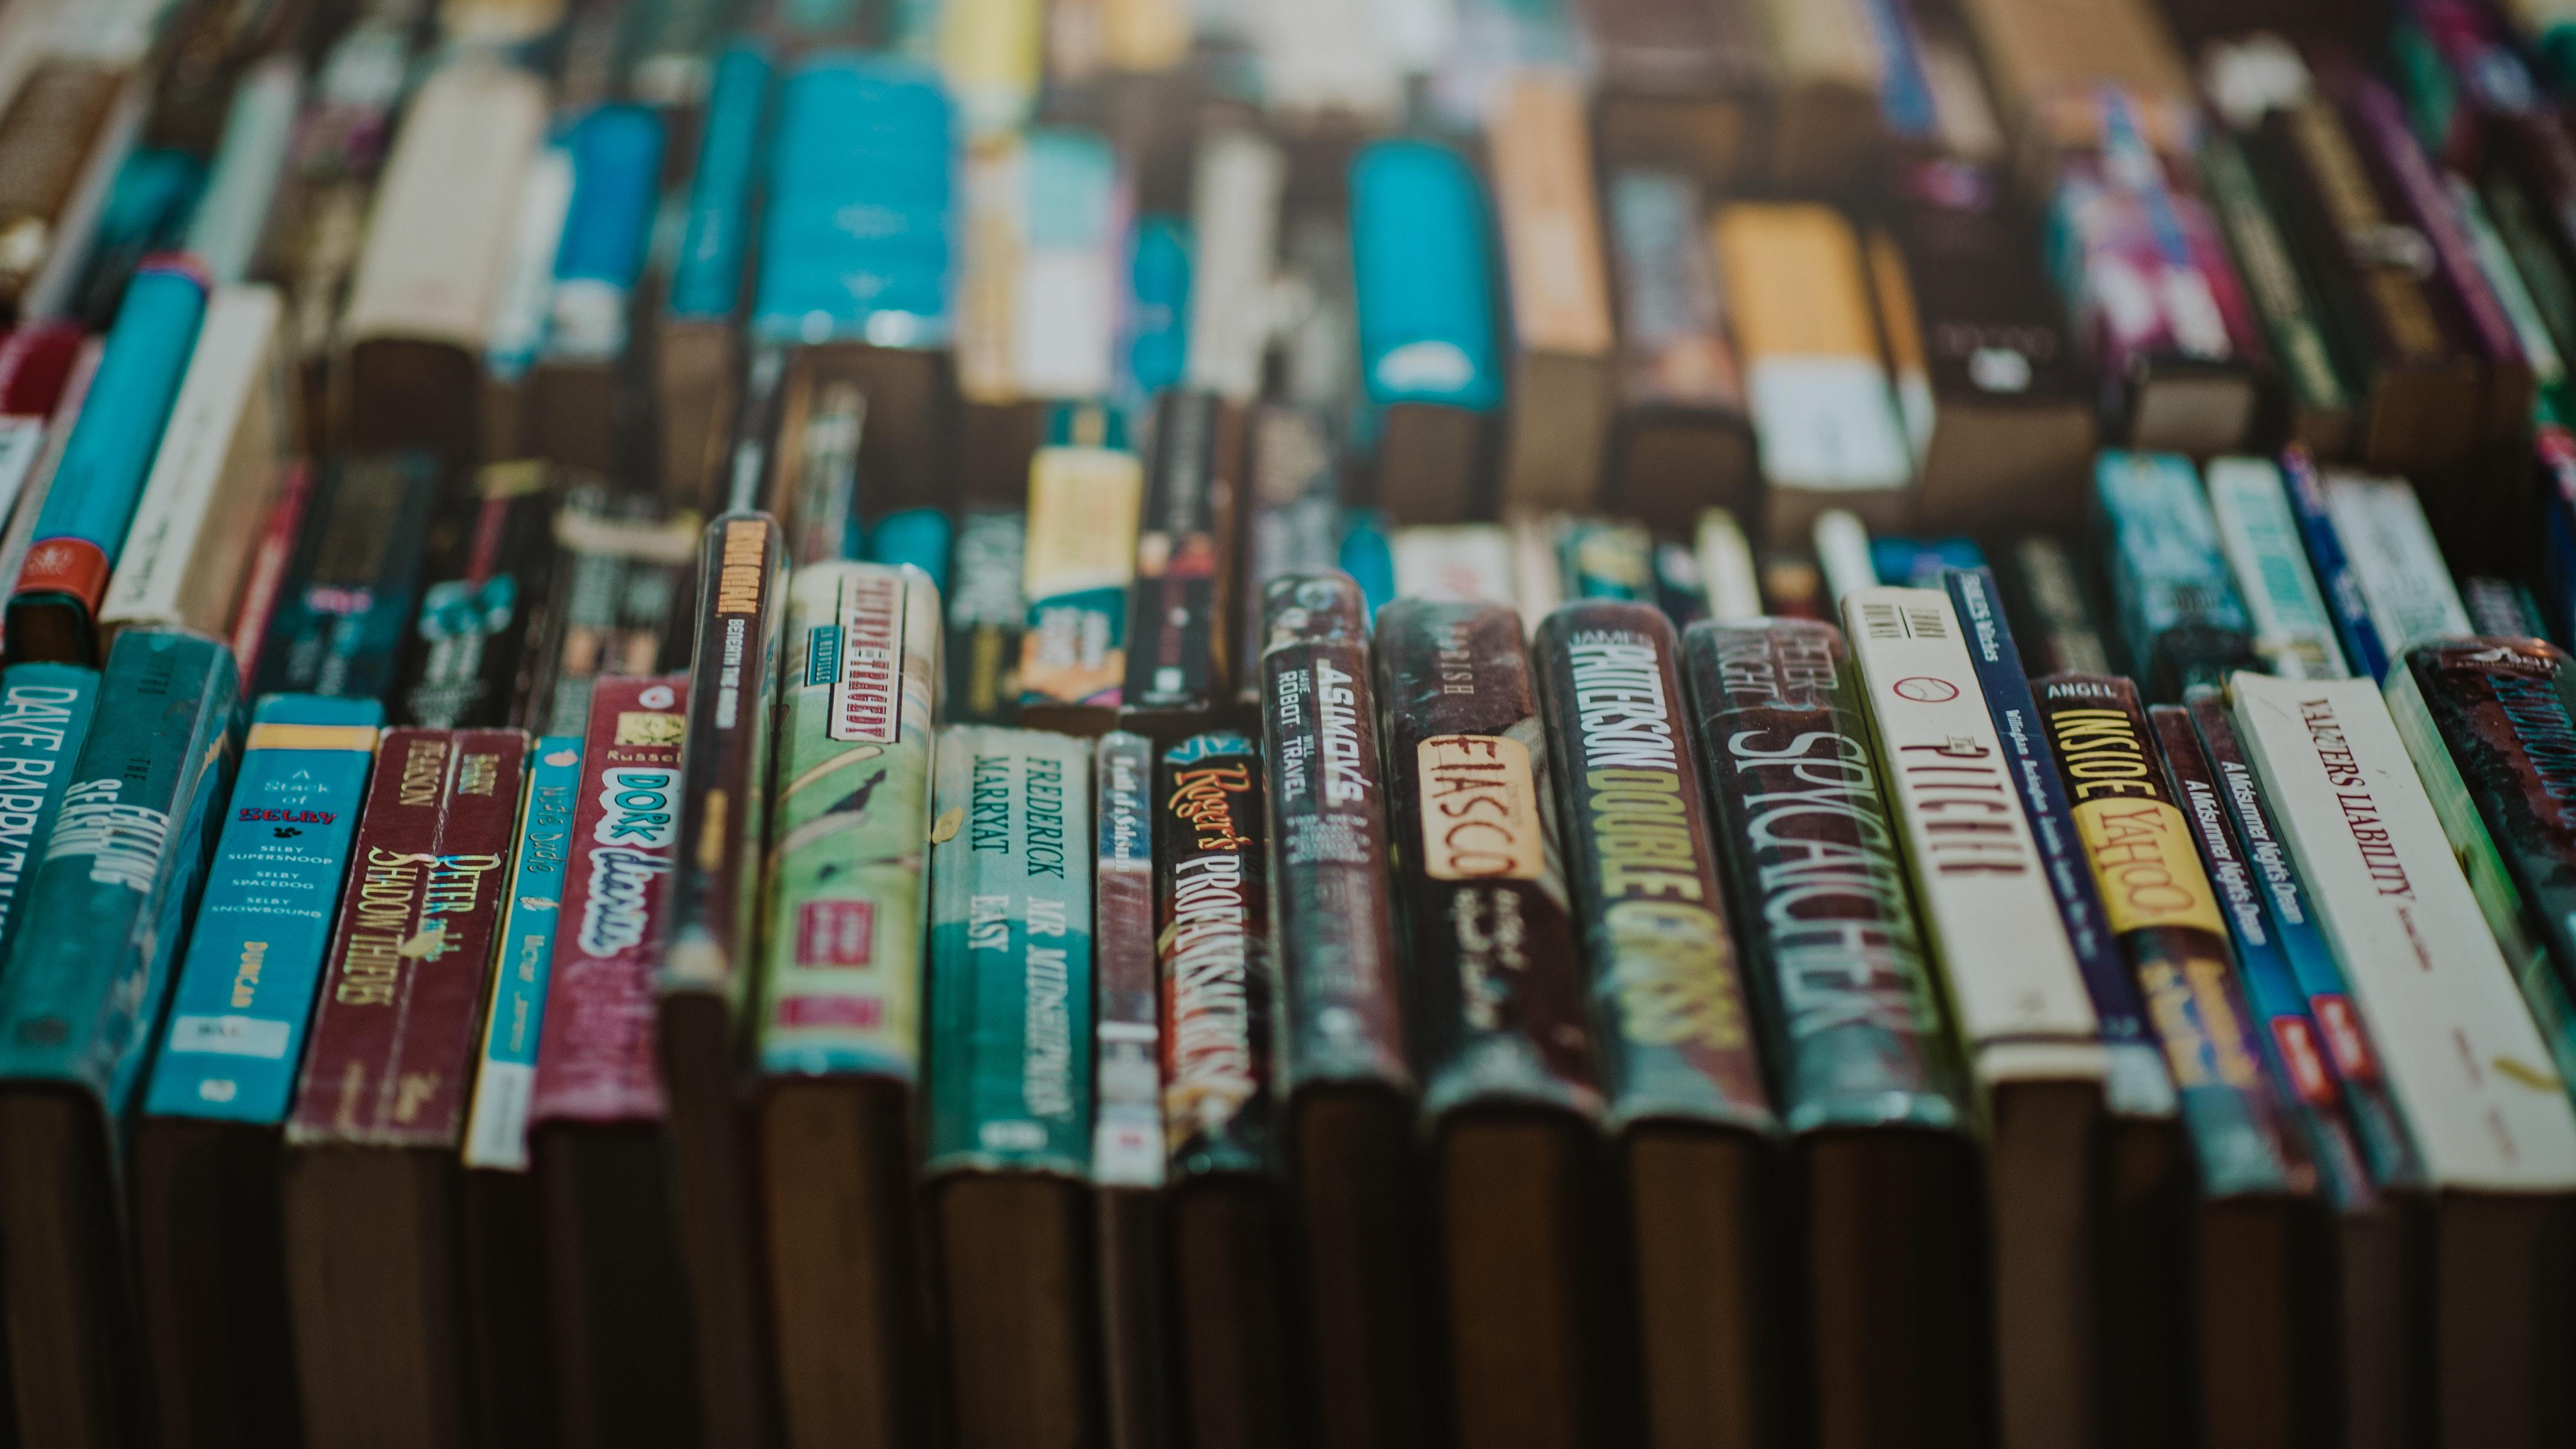 Assorted-title Novel Book Photo, Abundance, Literature, Title, Text, HQ Photo